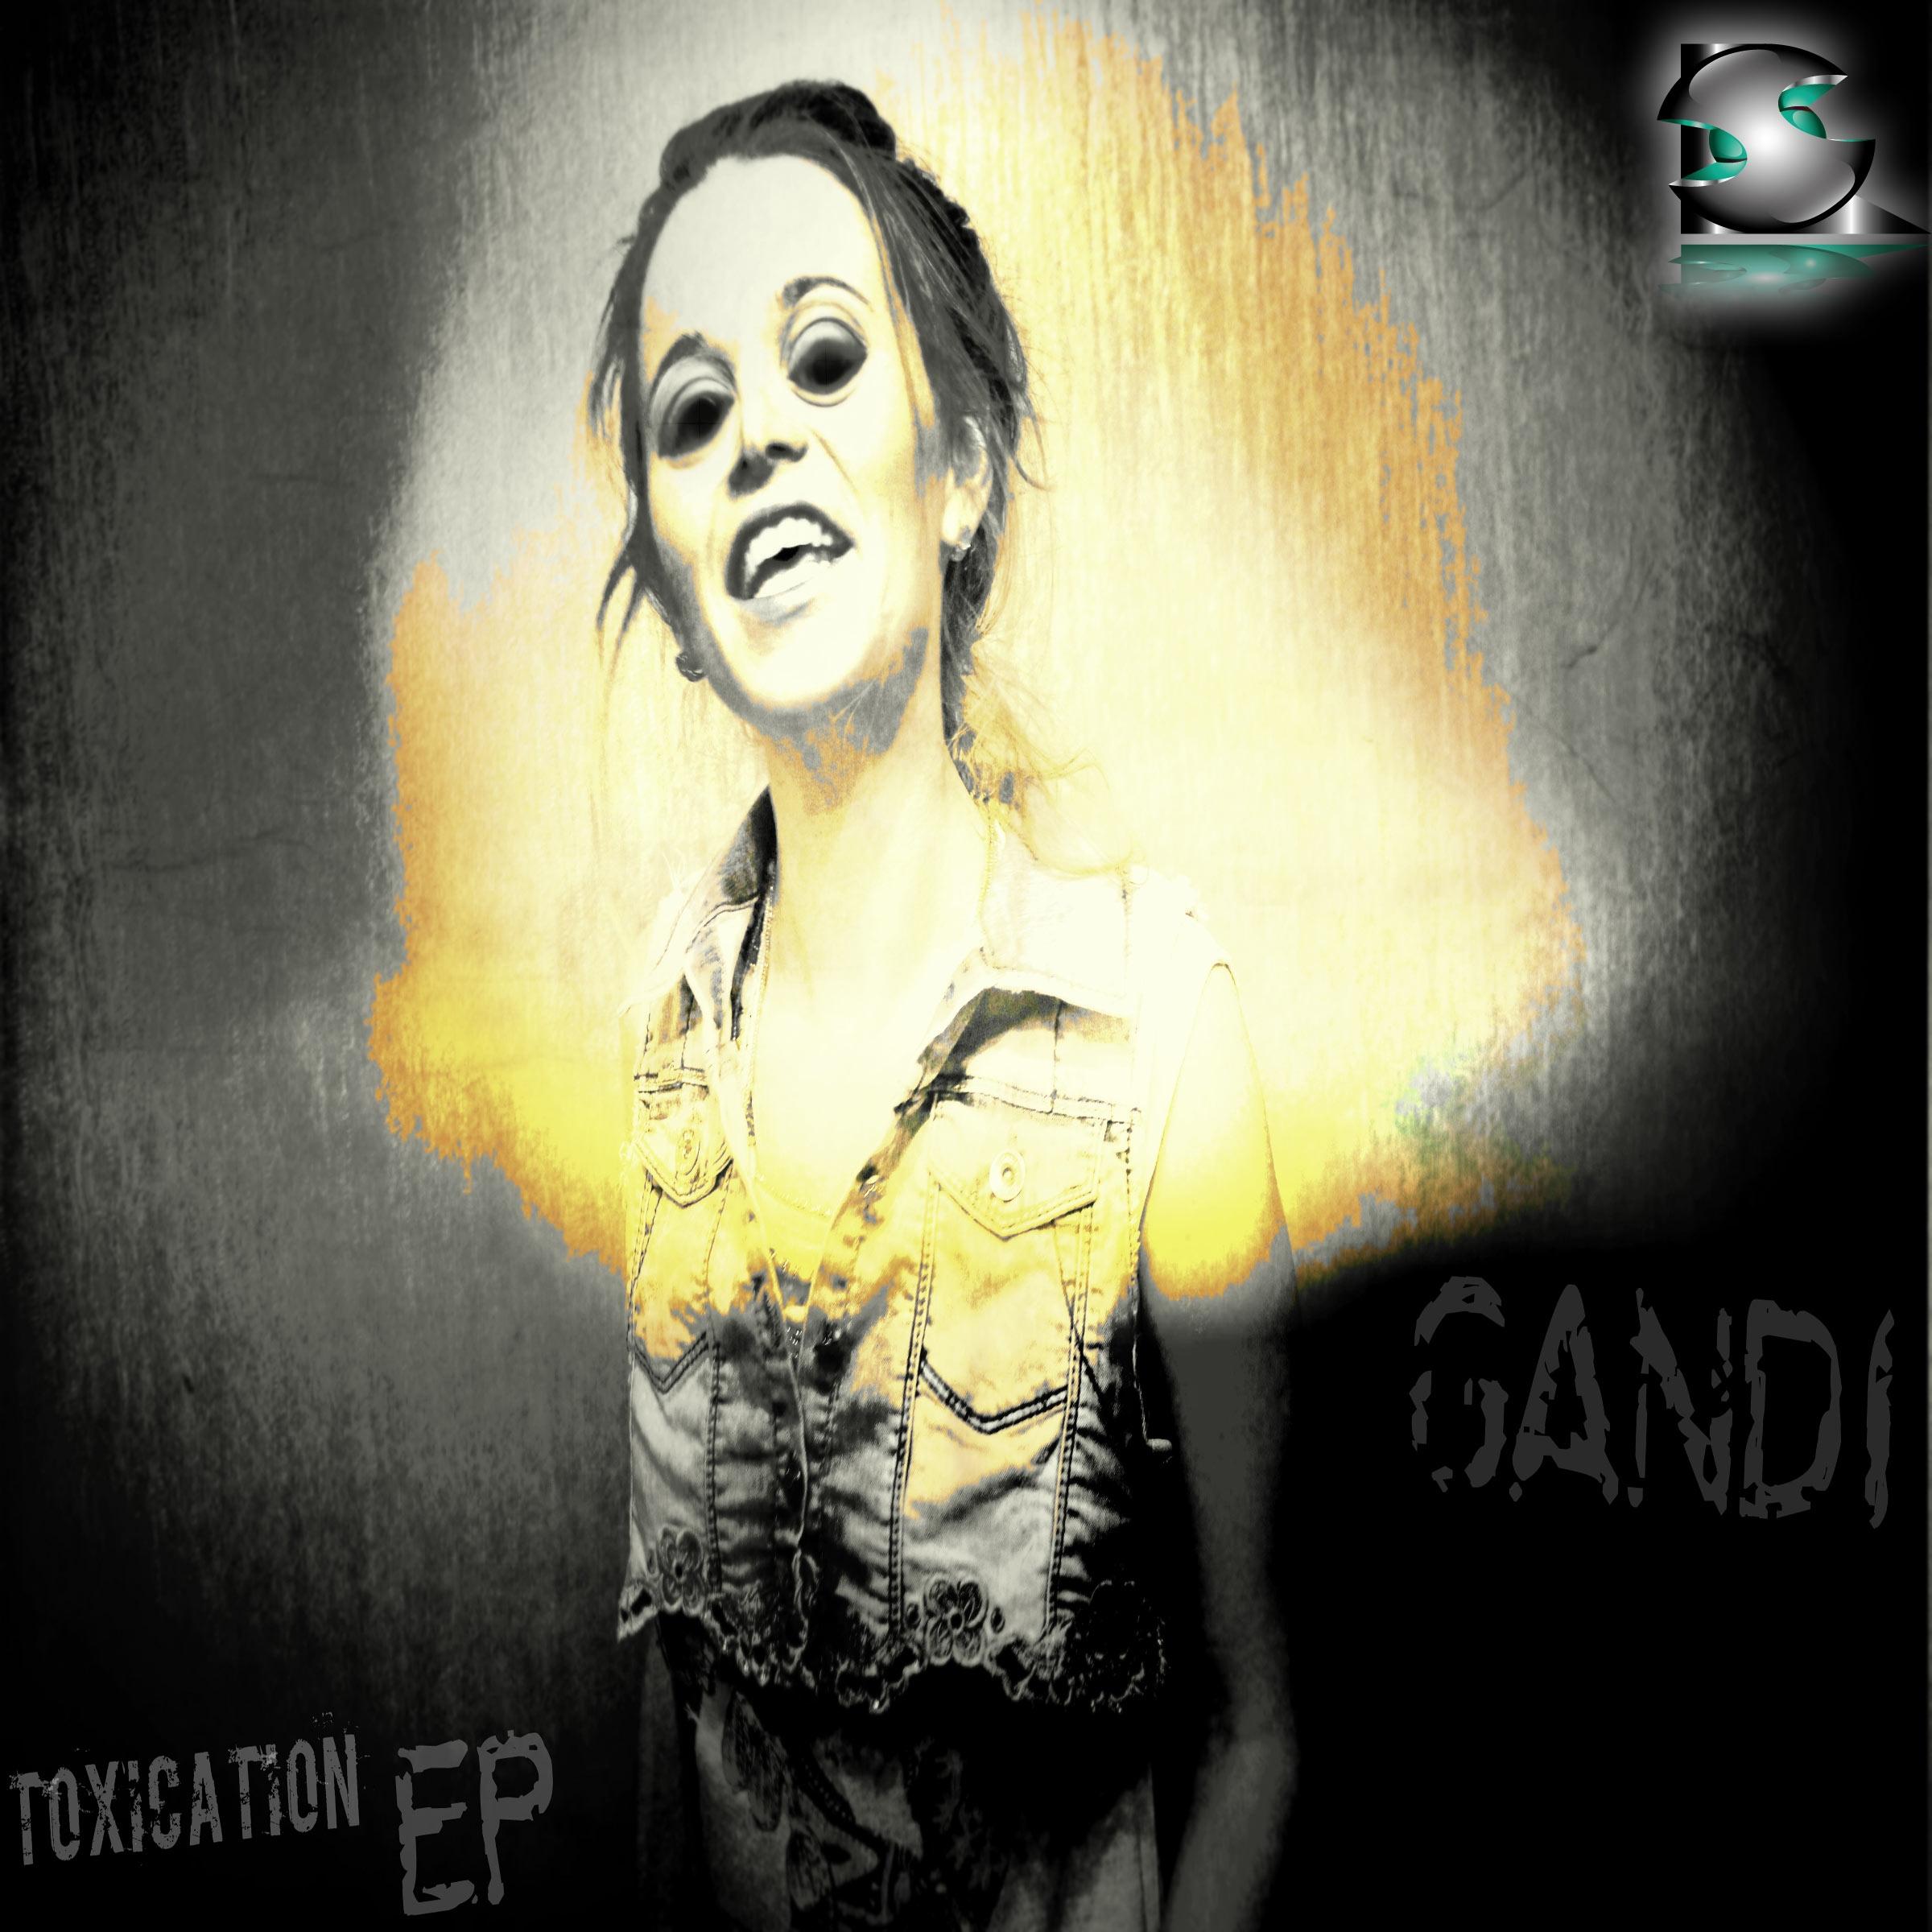 GANDI - Helo America (Original mix)